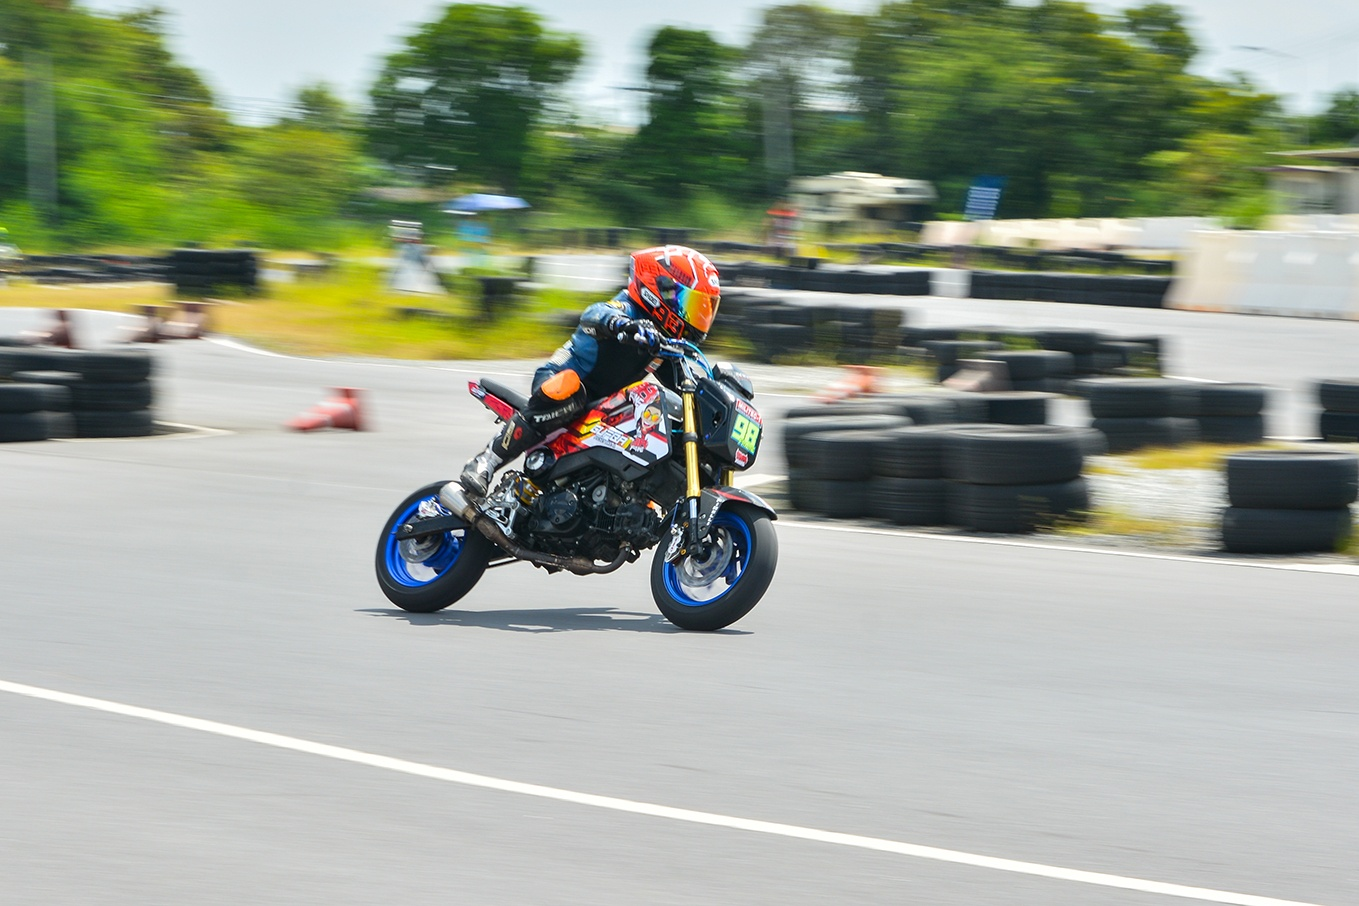 Giai dua moto tre em o Thai Lan va nhung giac mo MotoGP hinh anh 32